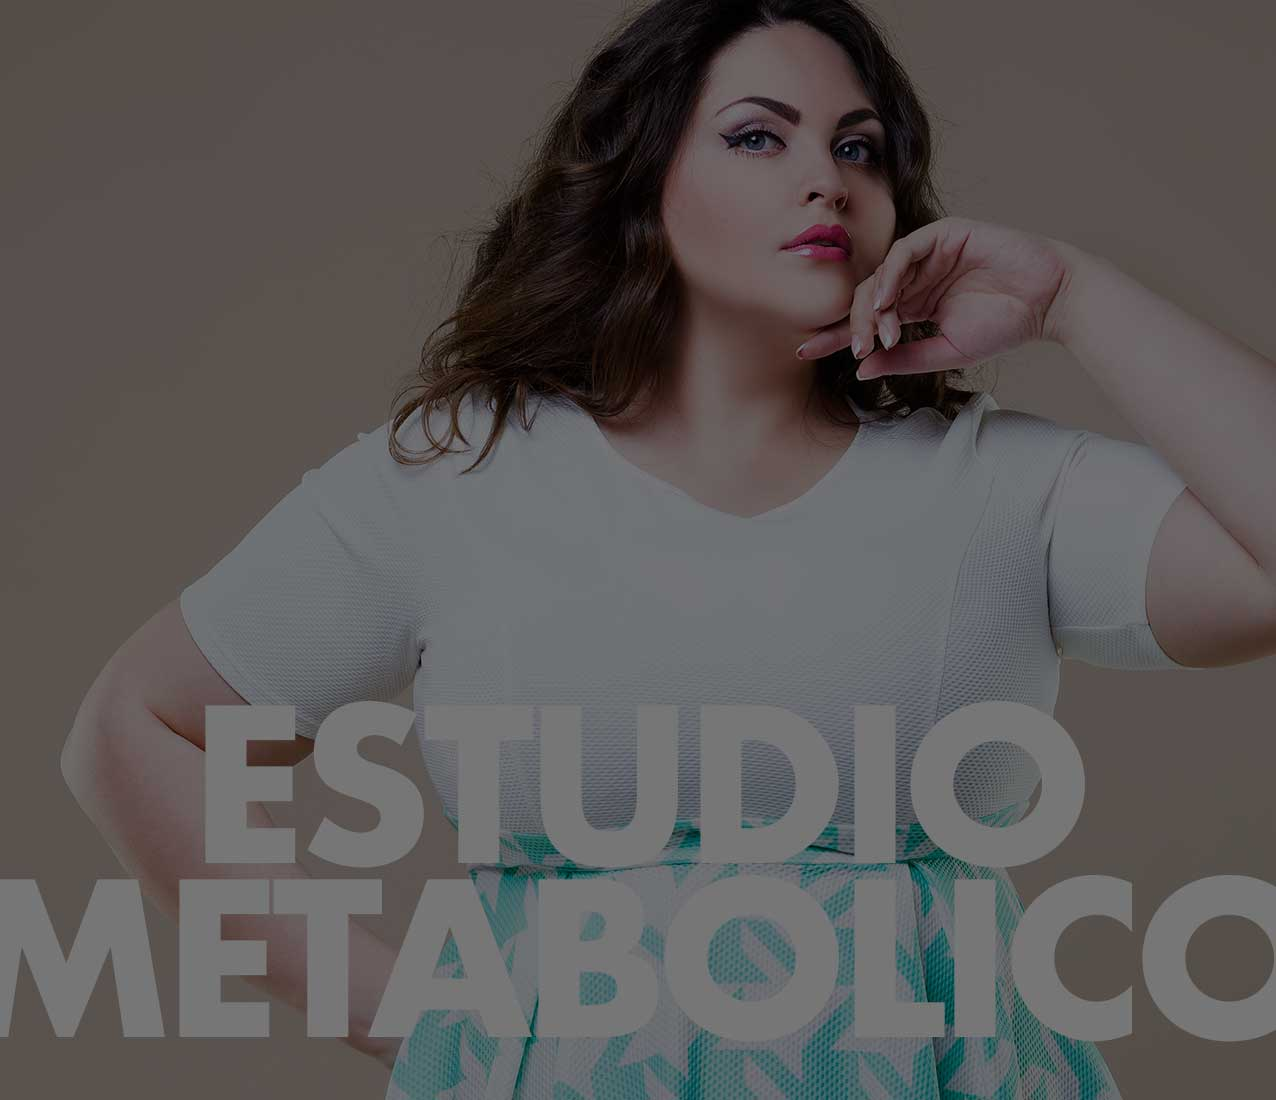 clinica para estudio metabolico